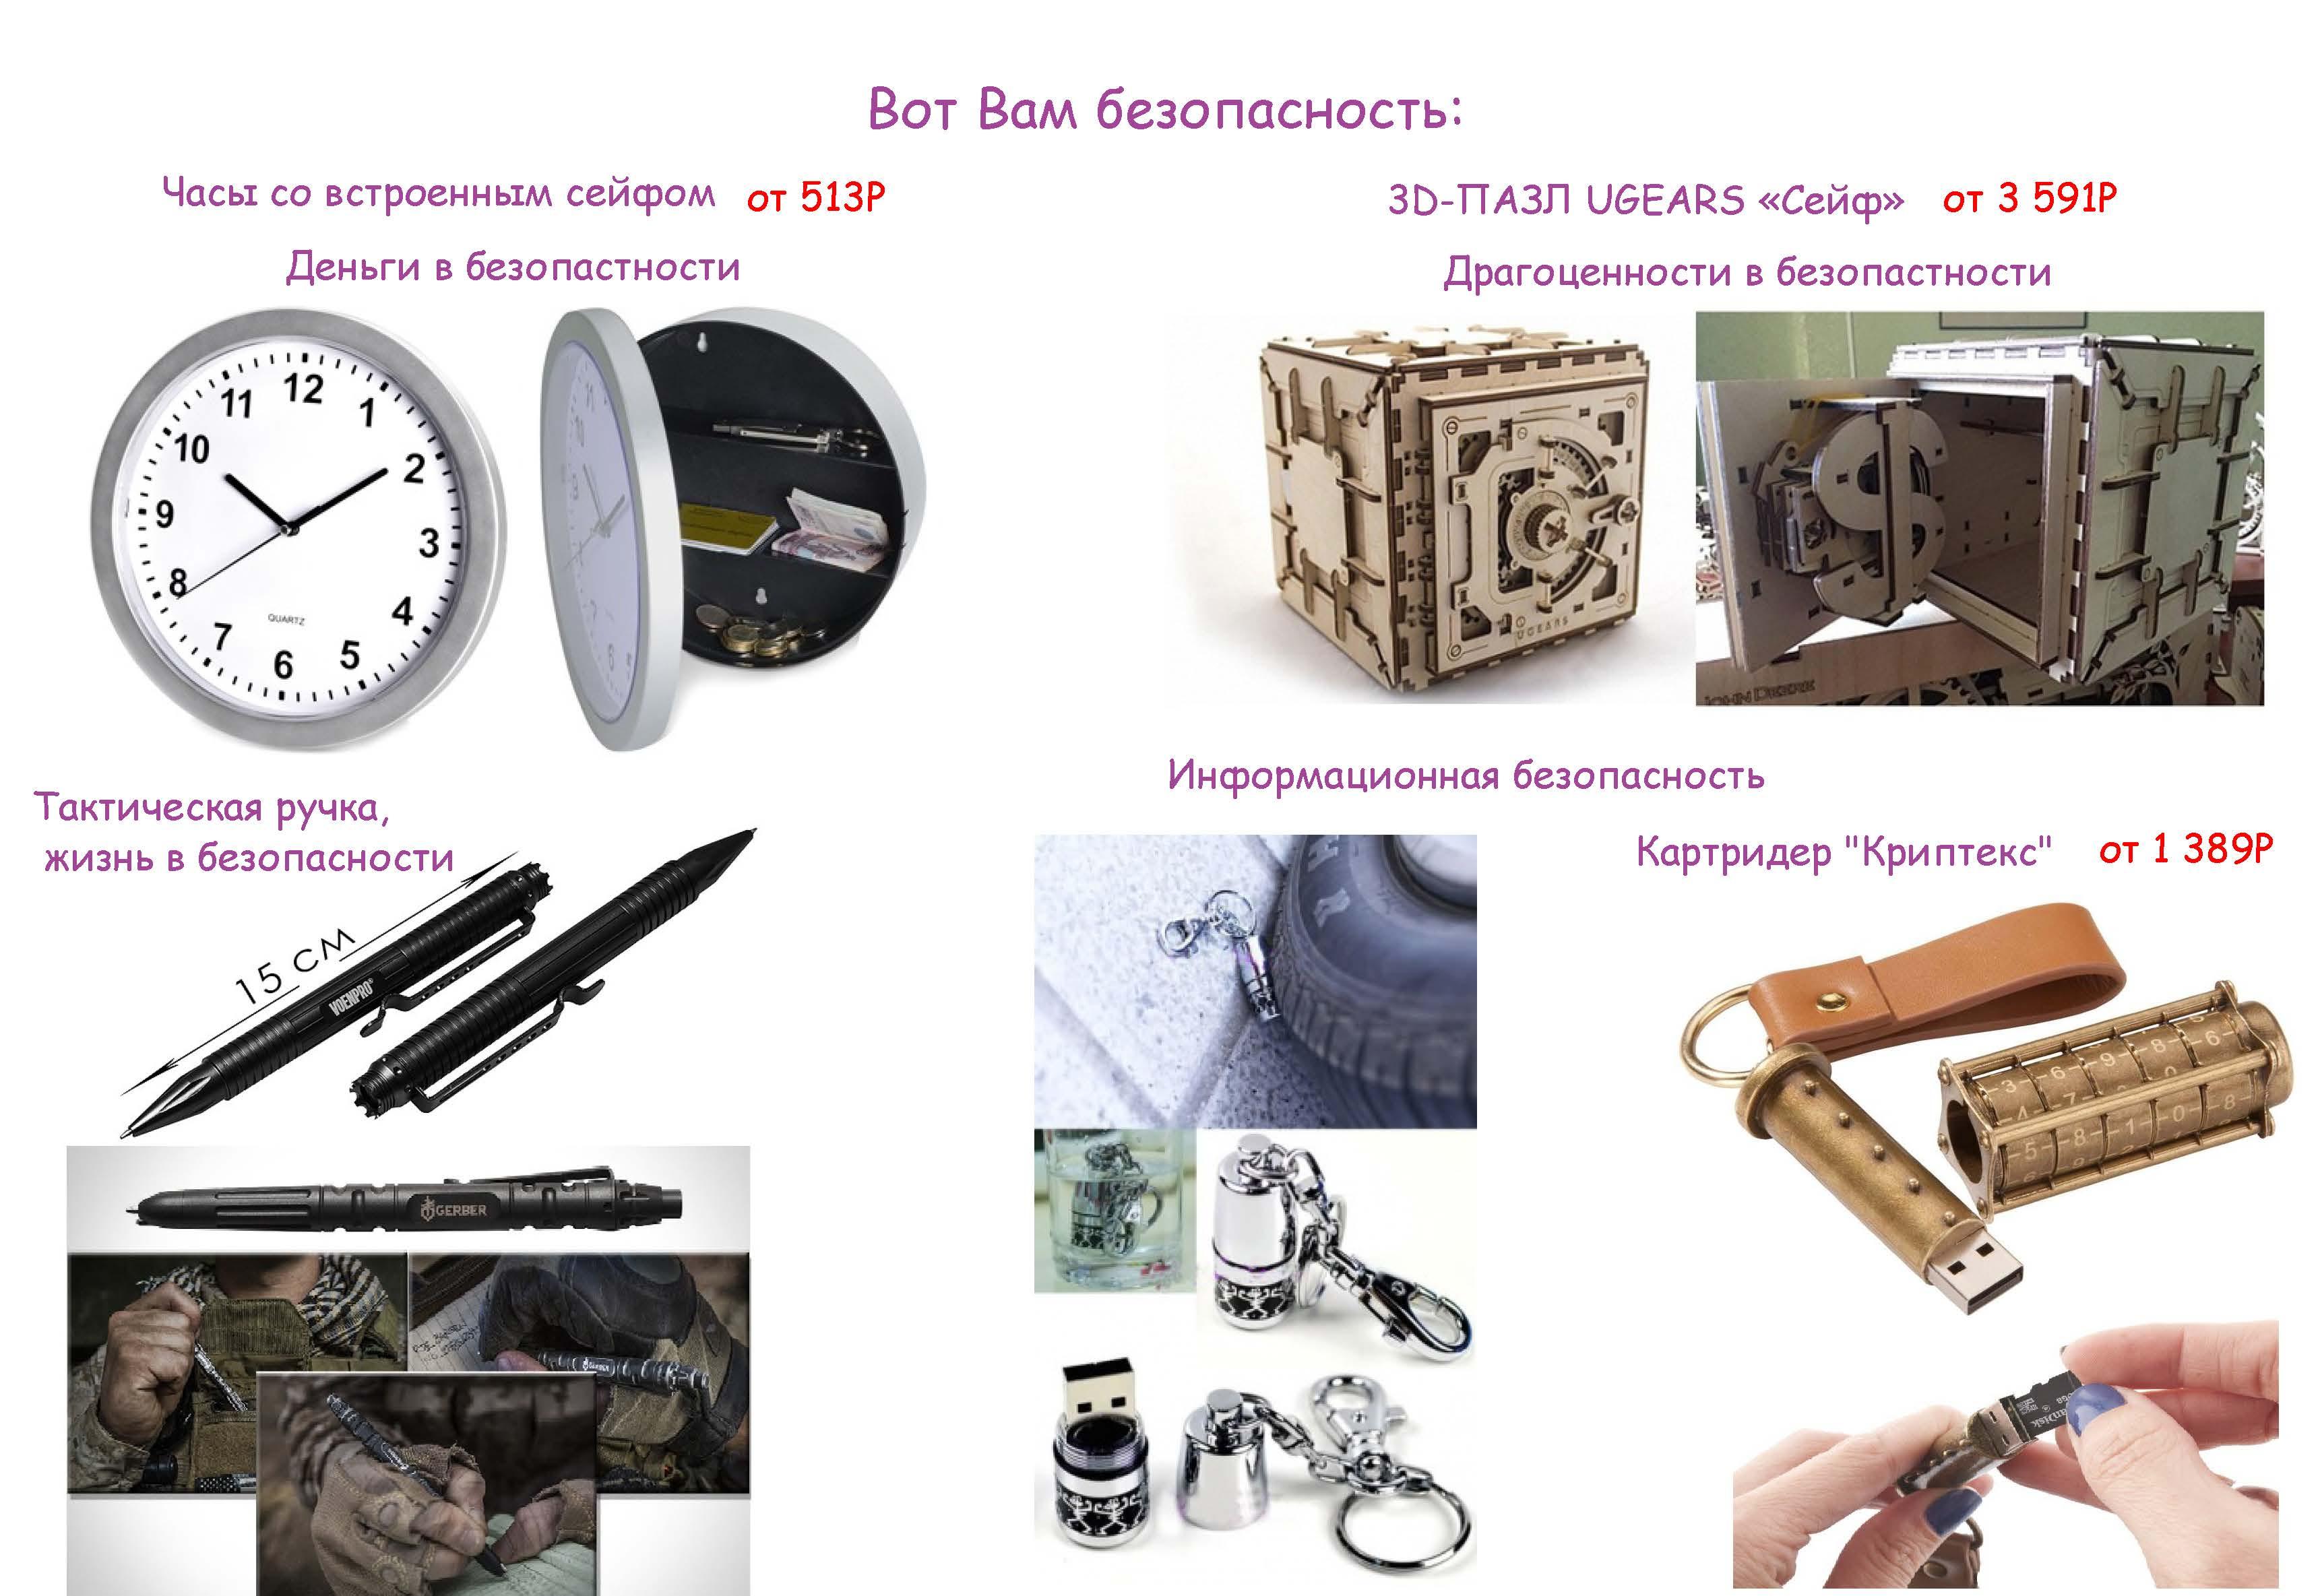 prezentation_ng_2017_stranitsa_10